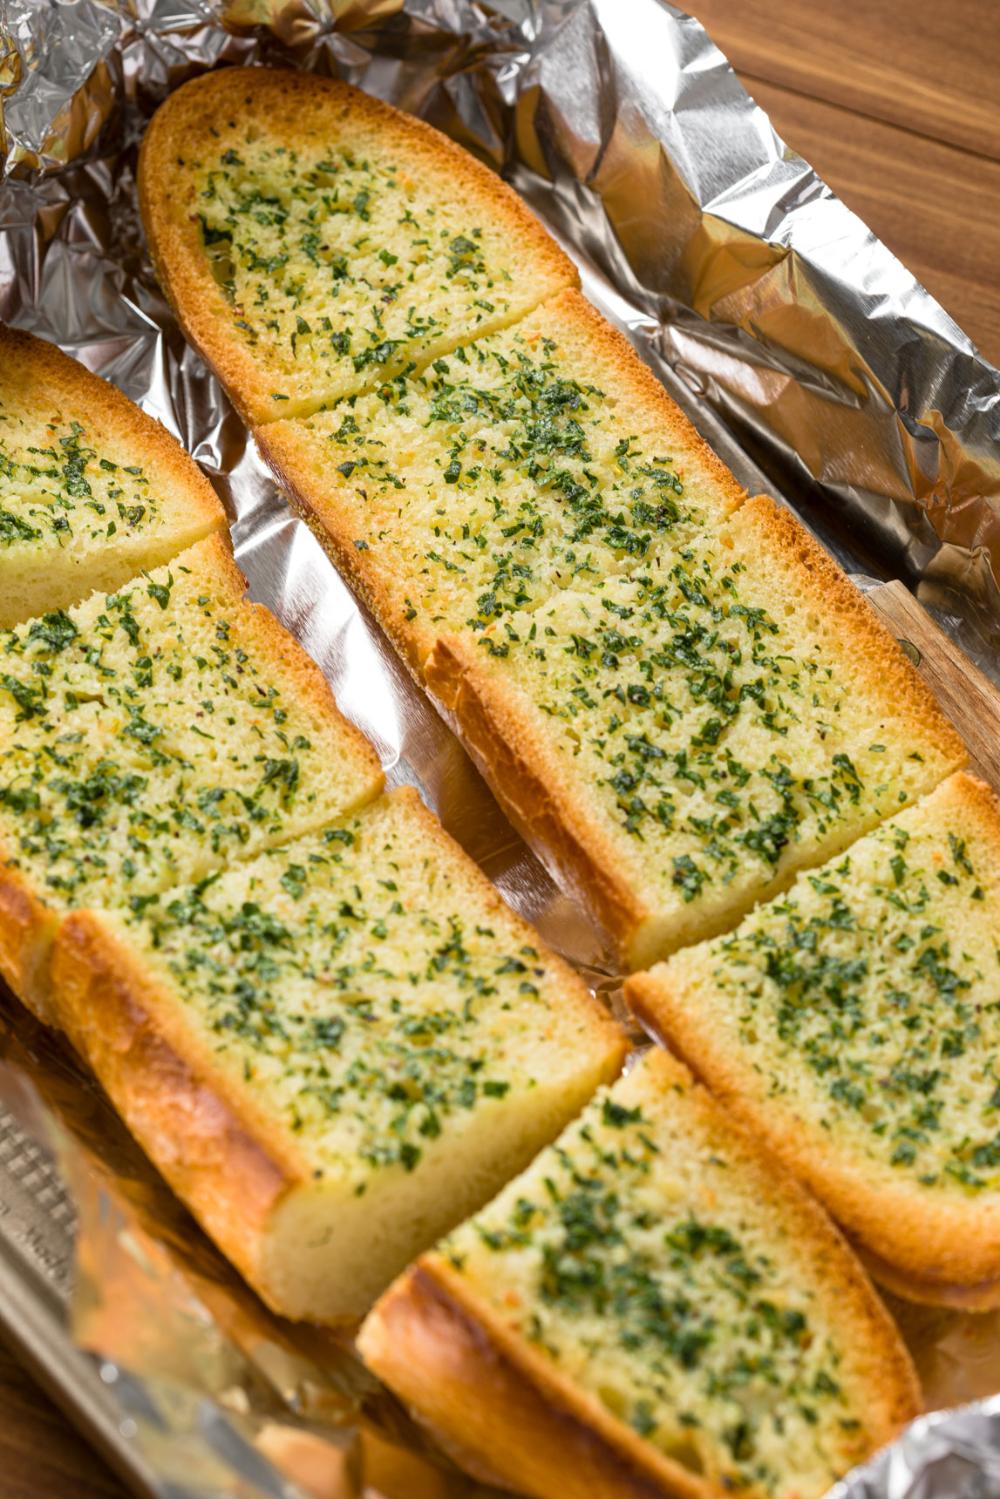 Garlic Bread Homemade Recipe Kippi At Home Recipe In 2021 Homemade Recipes Homemade Bread Ingredients Recipes